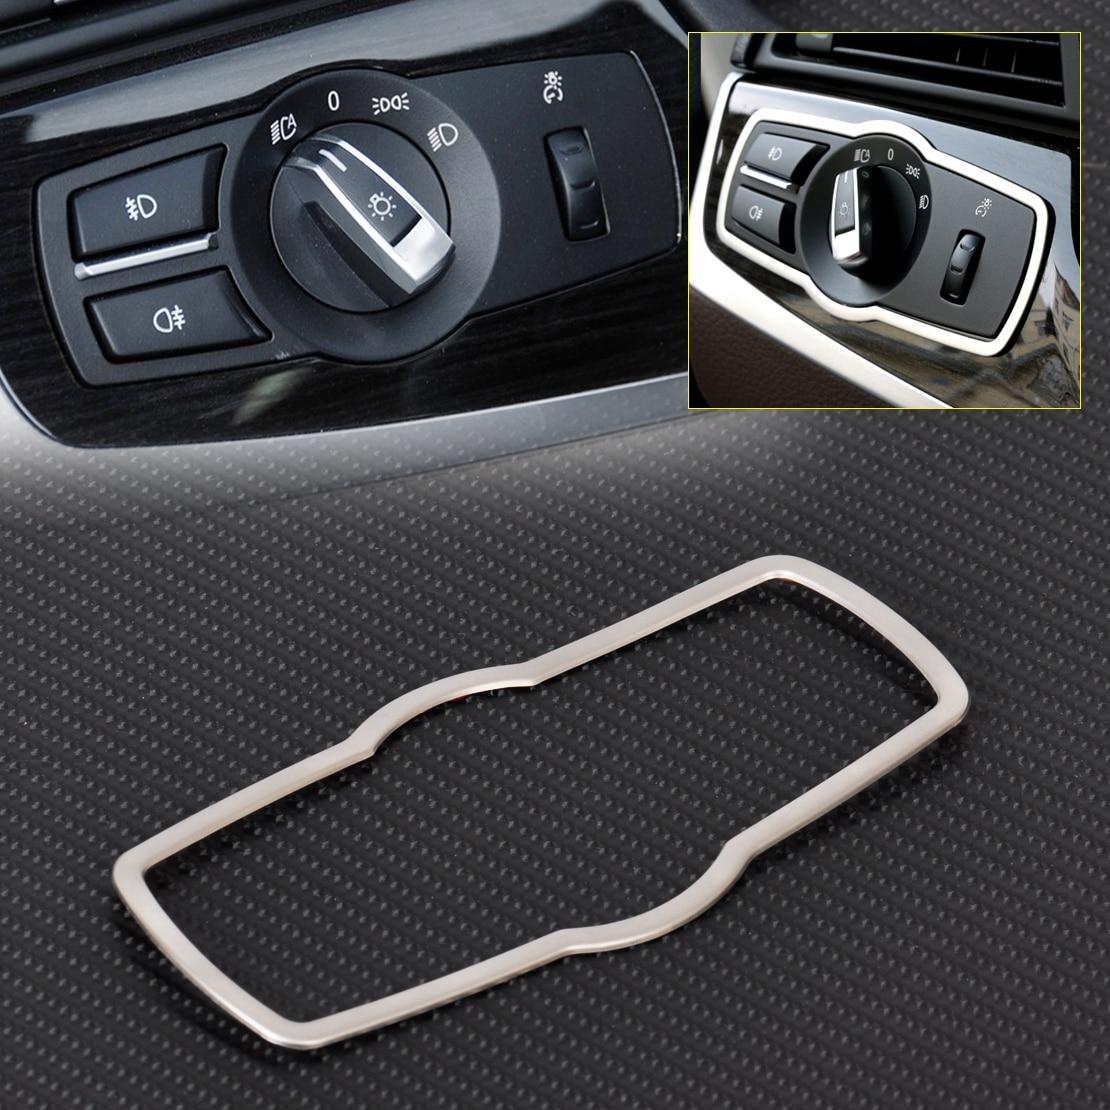 ABS cromo Interior faro cubierta de botón de interruptor Trim para BMW serie 5 X3 F25 X4 F26 2011, 2012, 2013, 2014, 2015, 2016